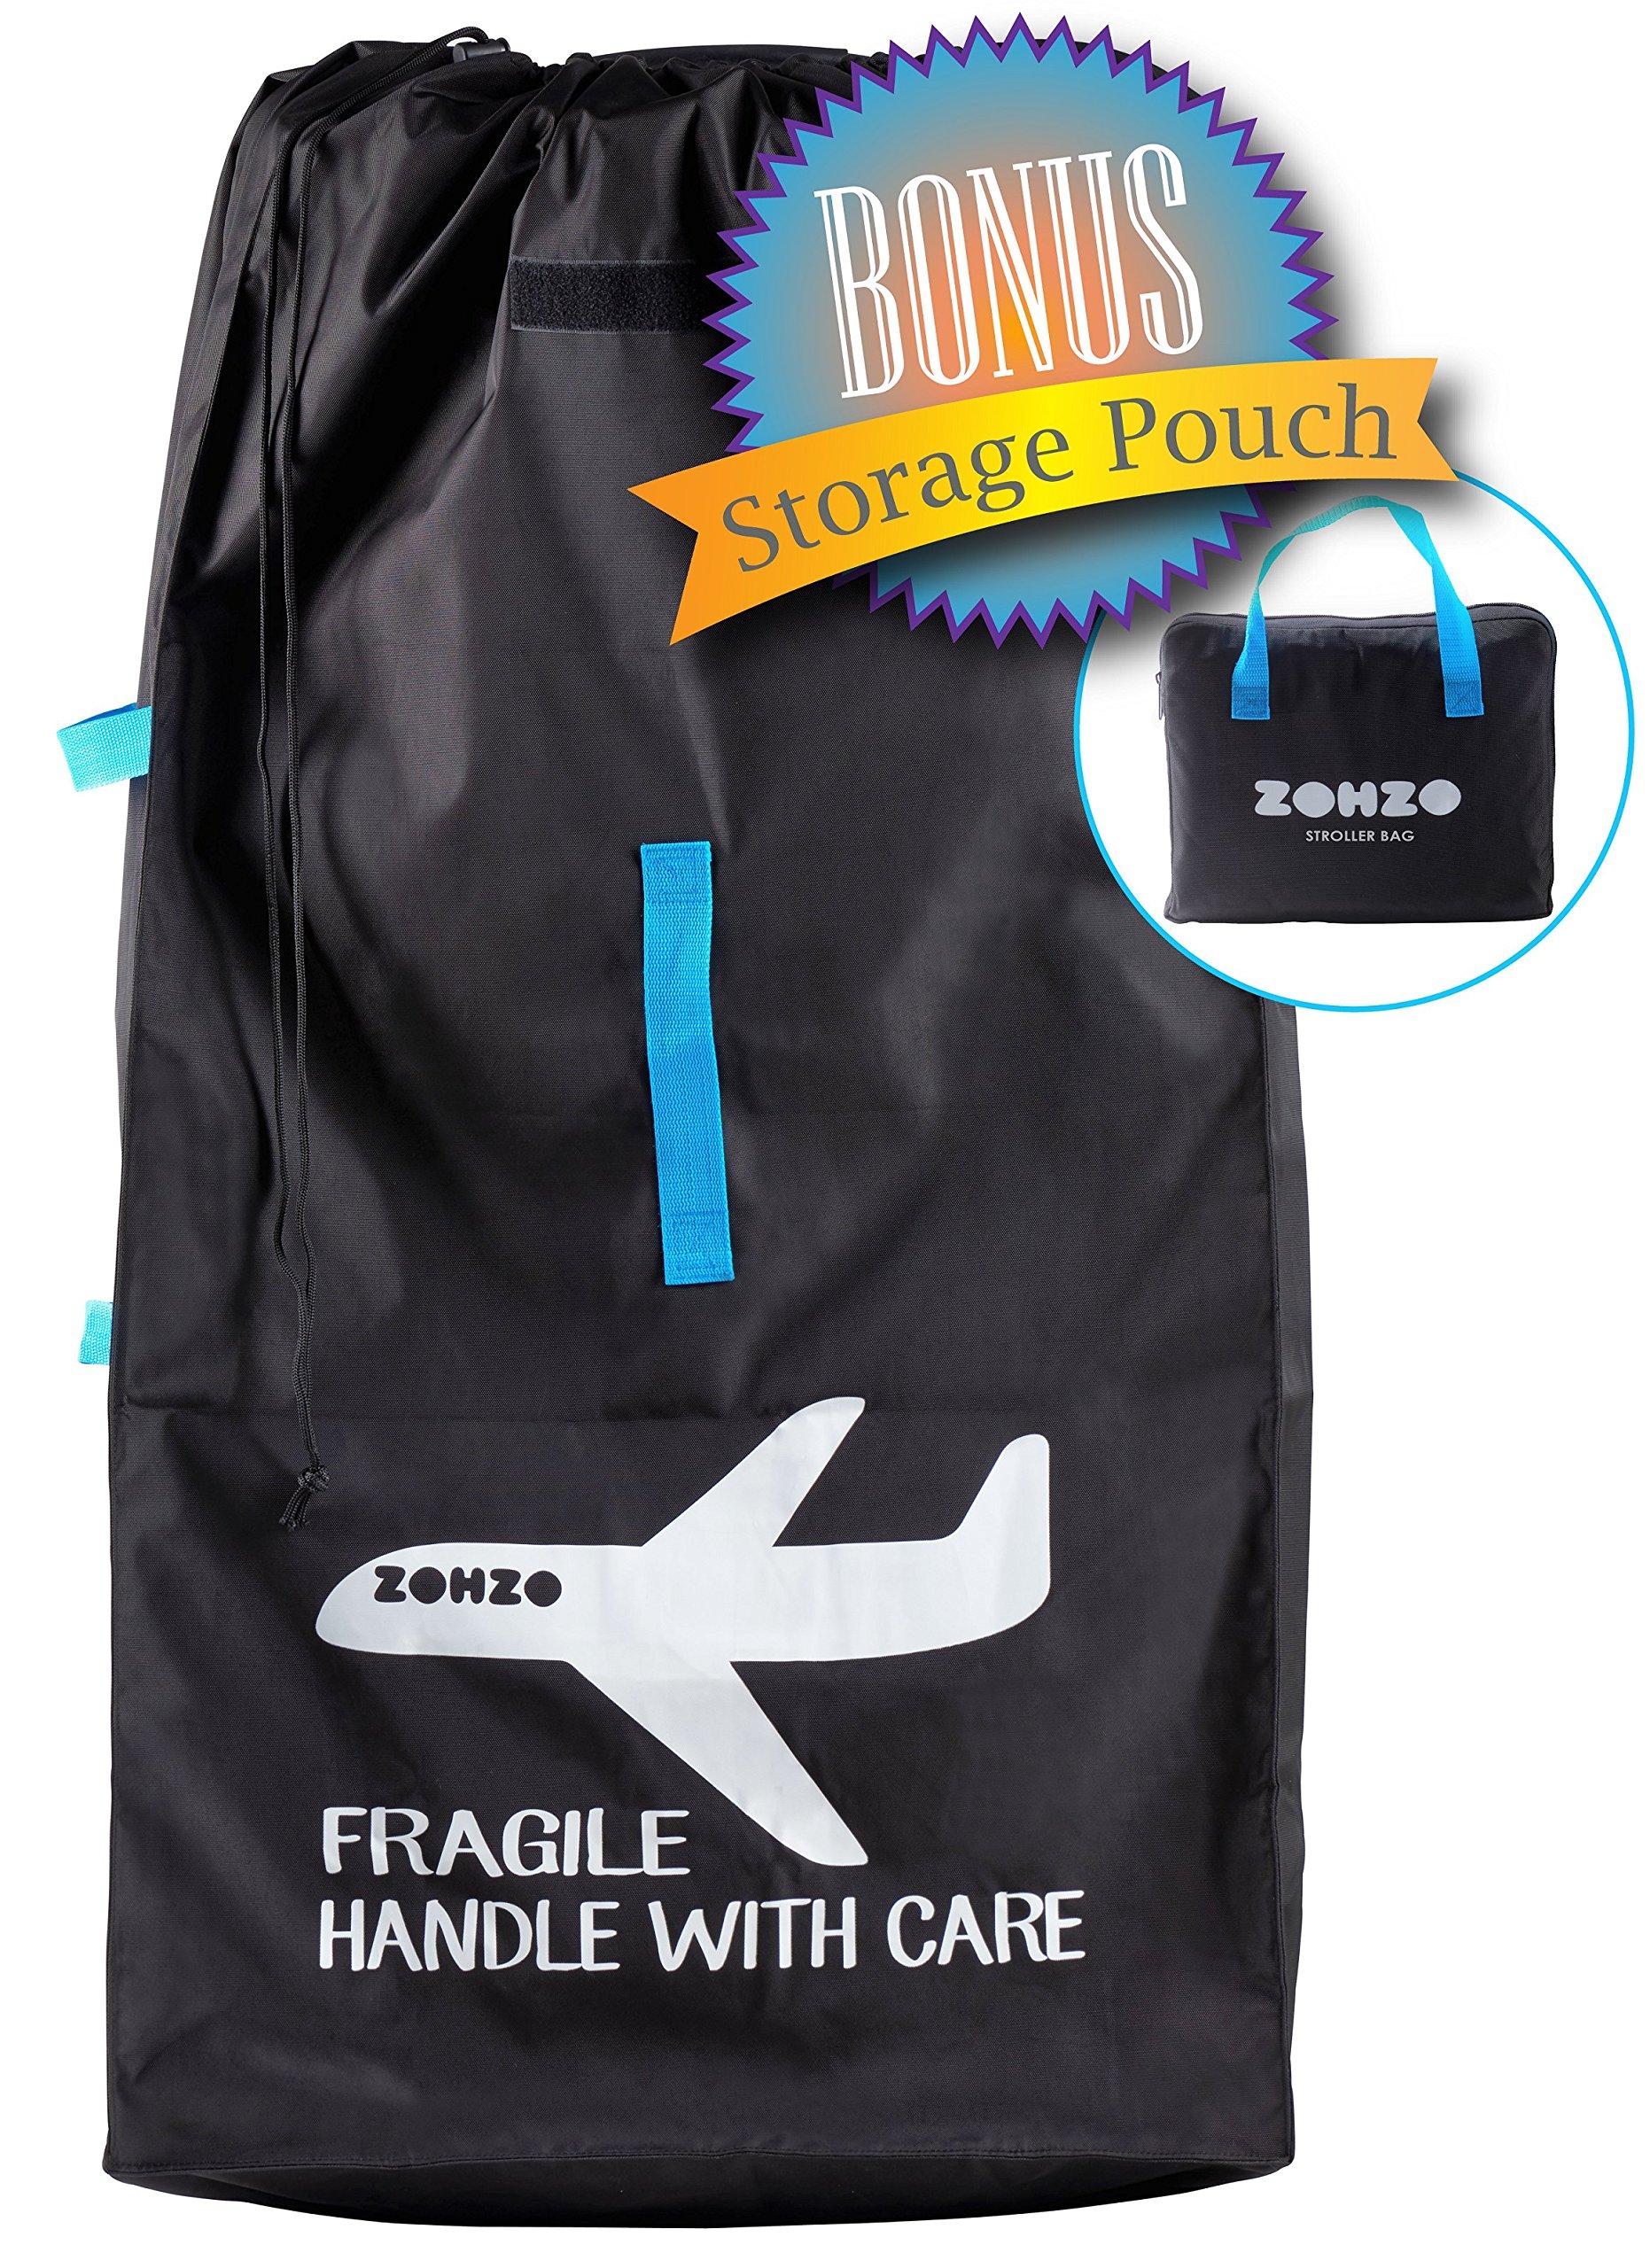 Zohzo Drawstring Stroller Travel Bag - For Air Travel with Double Stroller, Single Stroller, or Umbrella Stroller (Black)